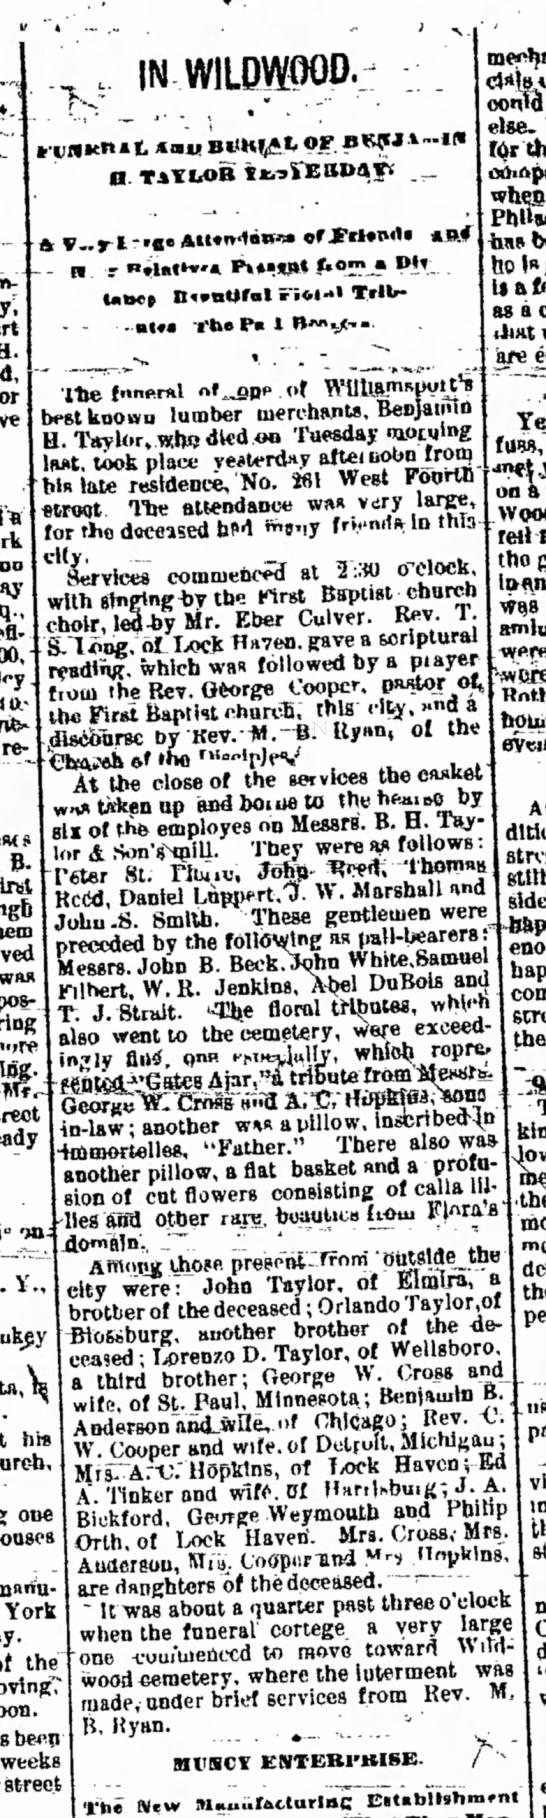 Obit B. H. TaylorWilliamsport Sun-Gazette Williamsport, PennsylvaniaSaturday, February 16, 1884  -